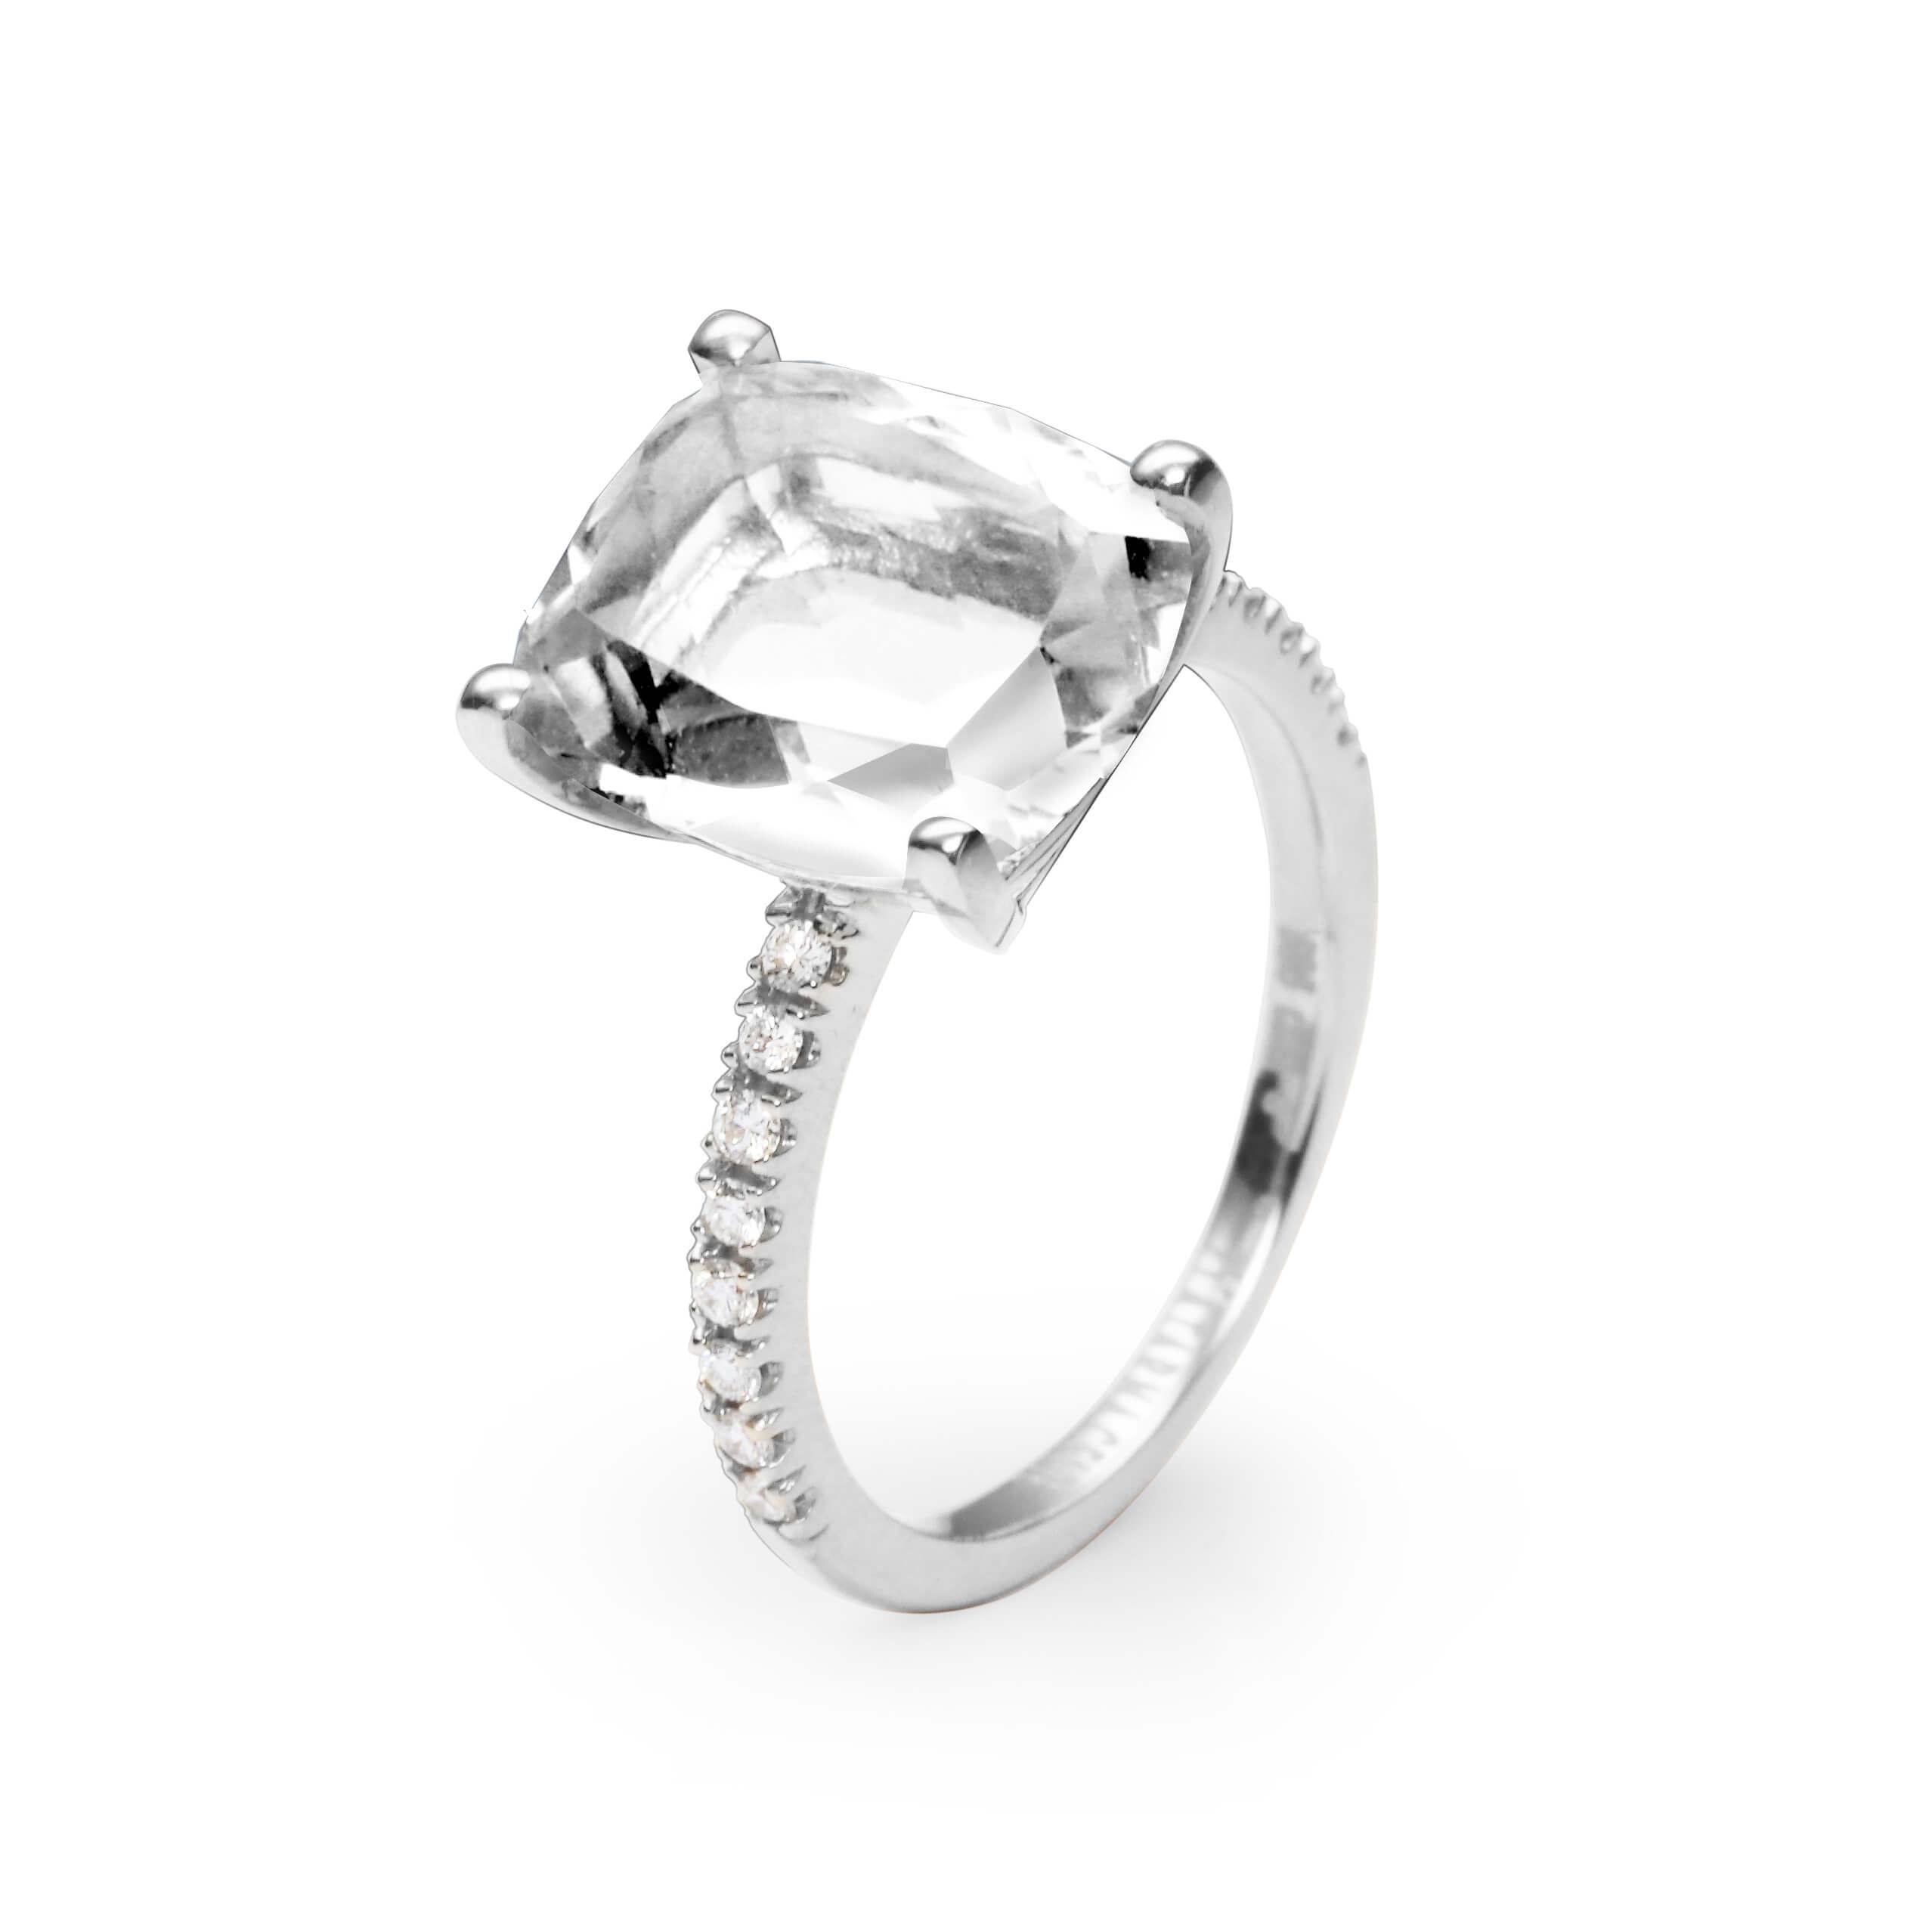 Bijeli topaz ili plavi topaz ili roze kremen 12 x 10 mm – 1 x; diamant 0,01 ct – 16 x